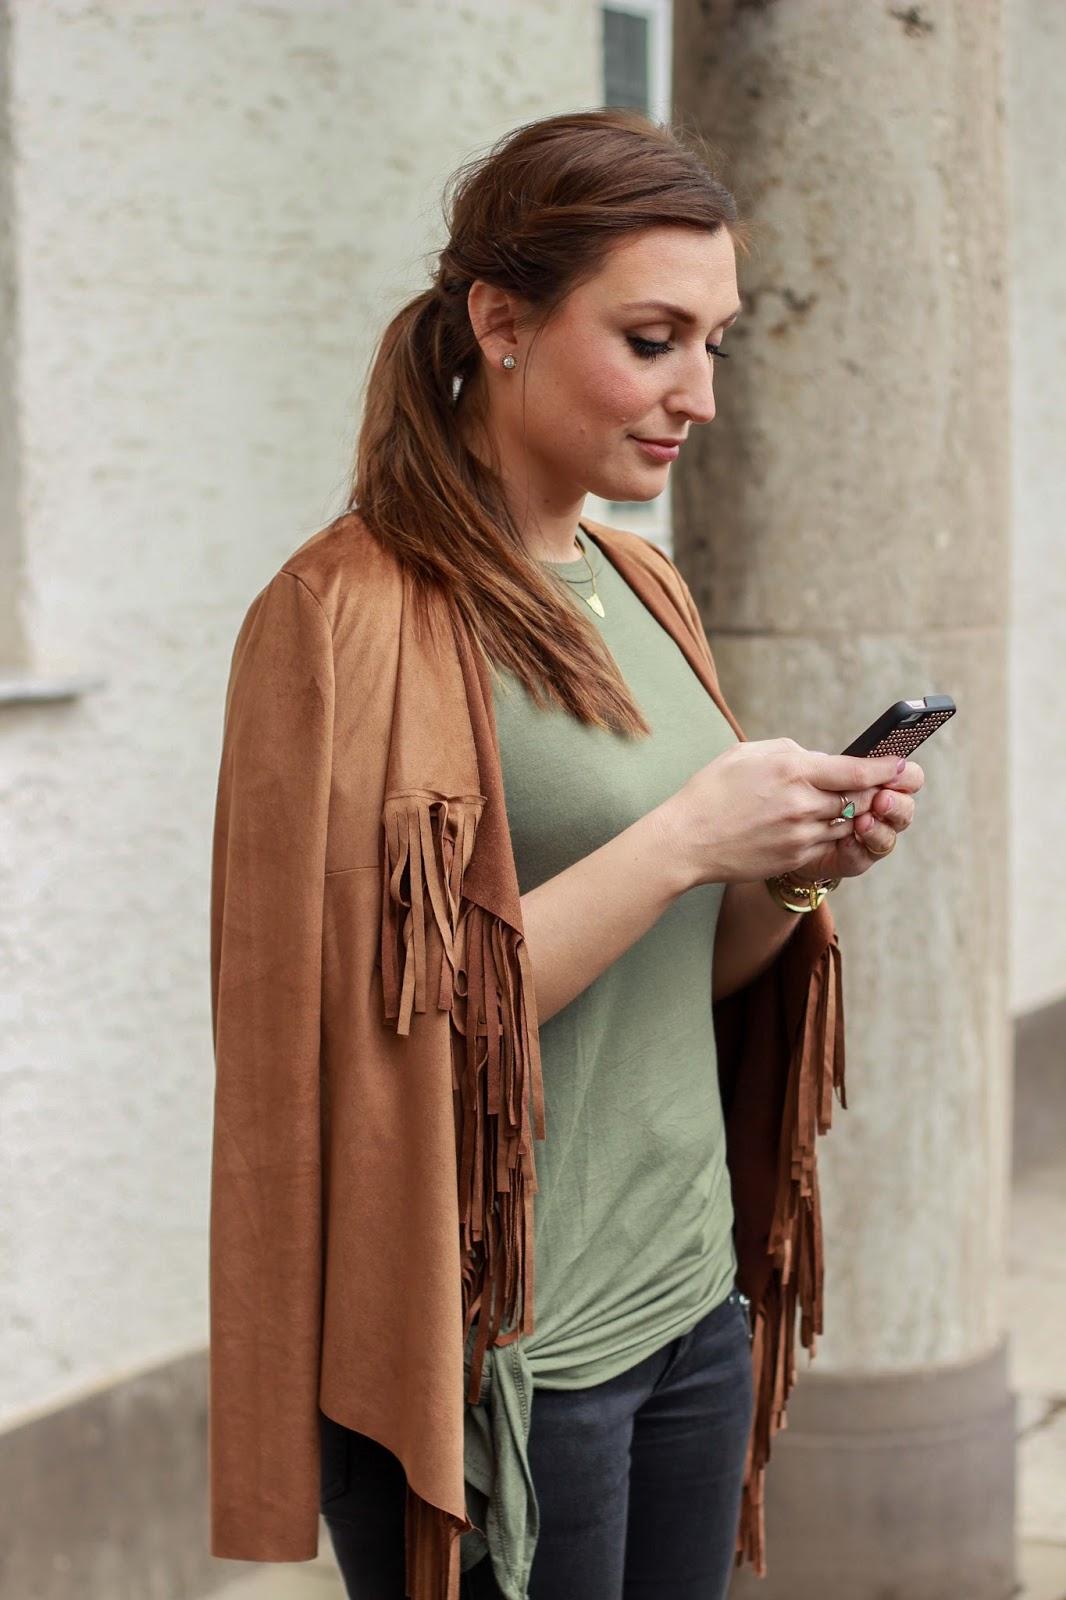 Fransenweste Fransen Wildlederjacke Wedges Streetstyle Modeblog